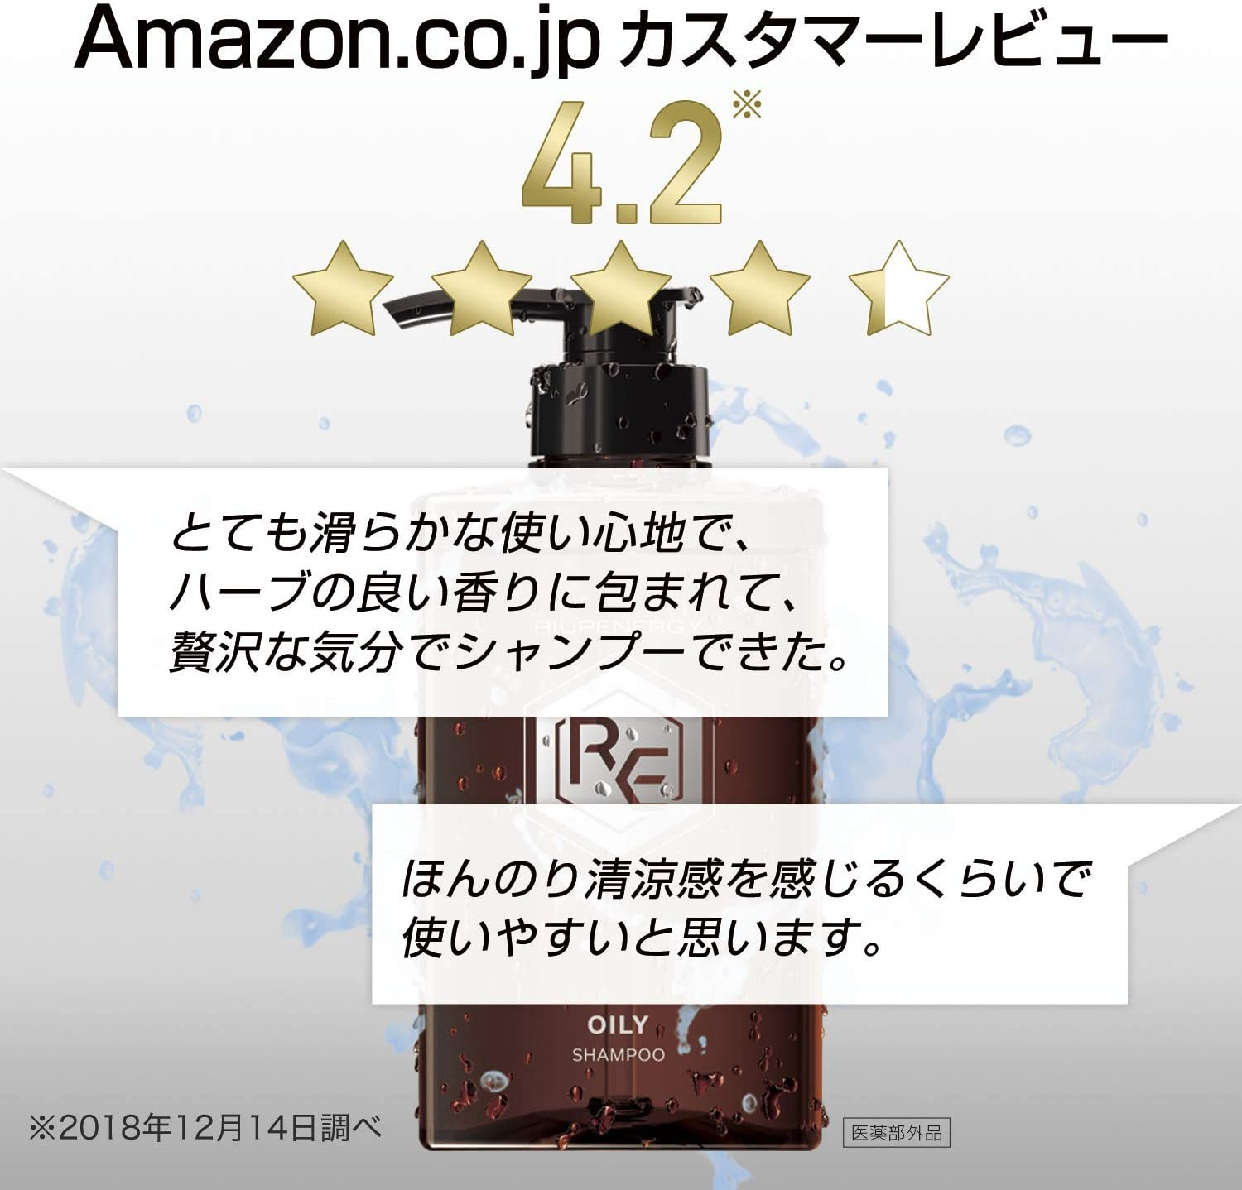 RIUPENERGY(リアップエナジー)薬用スカルプシャンプー オイリーの商品画像10